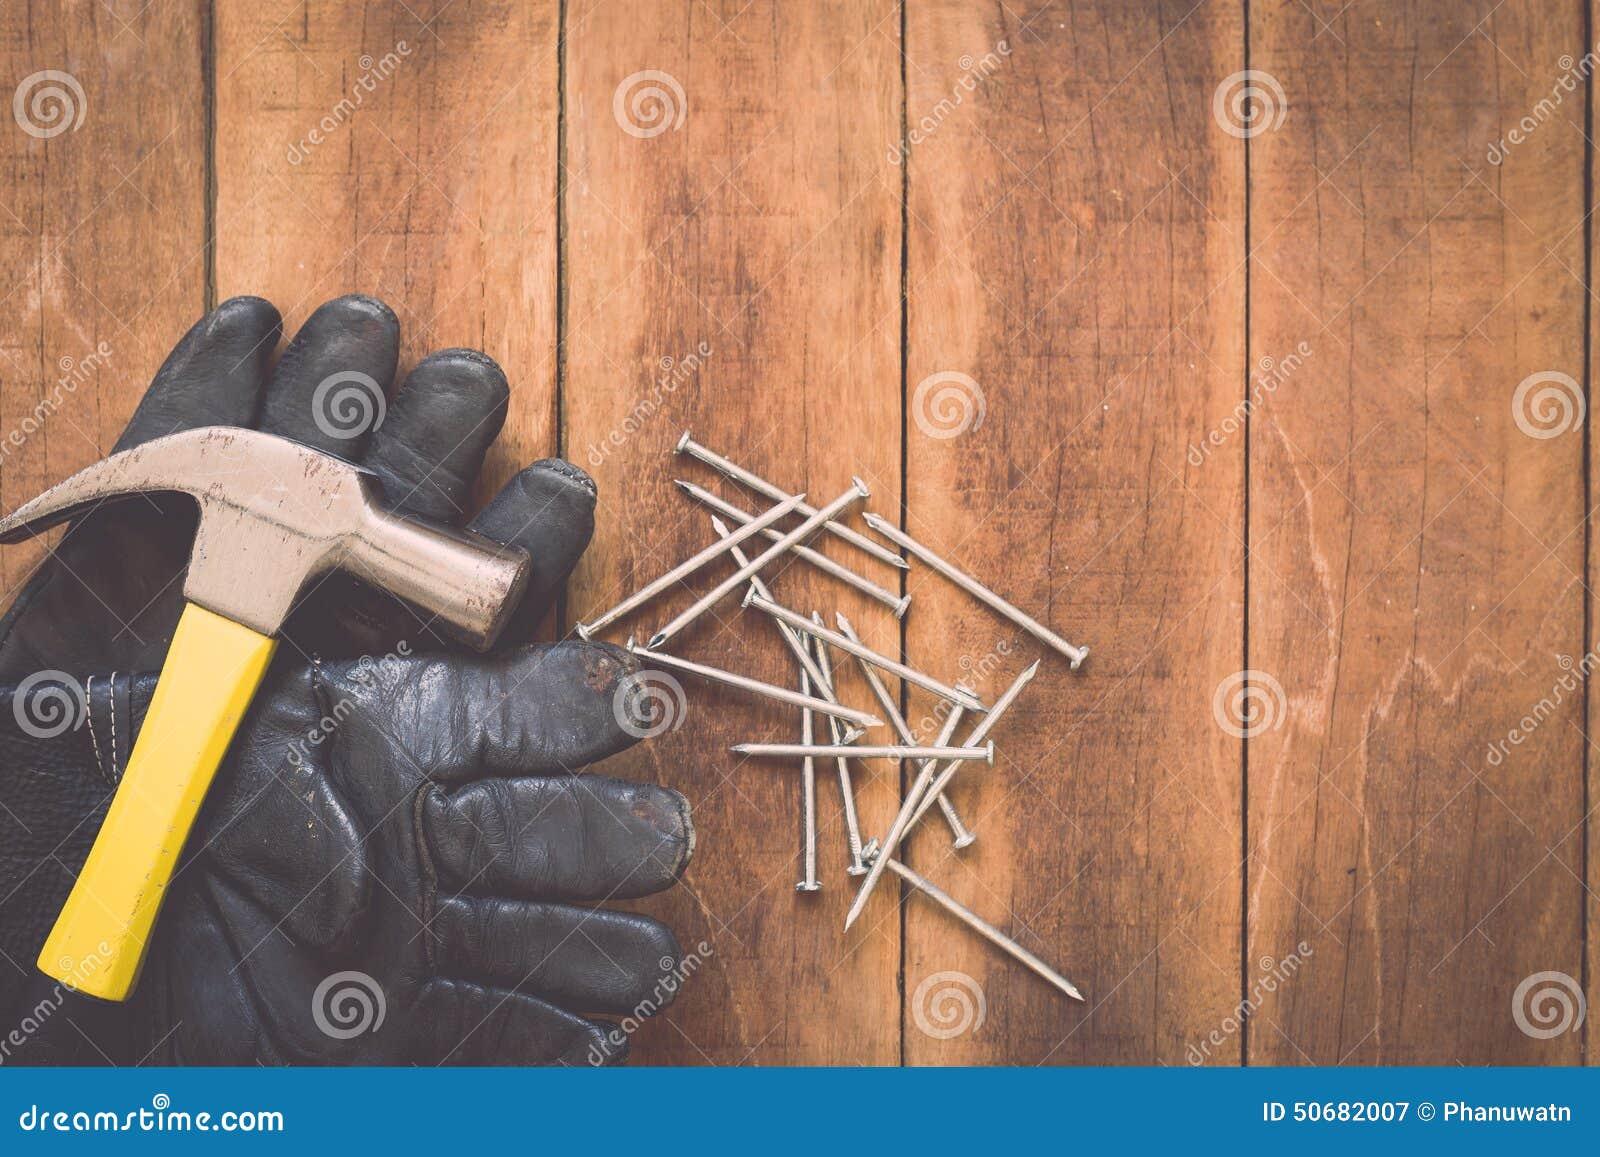 Download 在木头的被分类的工作工具 库存图片. 图片 包括有 的协助, 投反对票, 硬件, 缓和, 钉子, 甲板, 地板 - 50682007